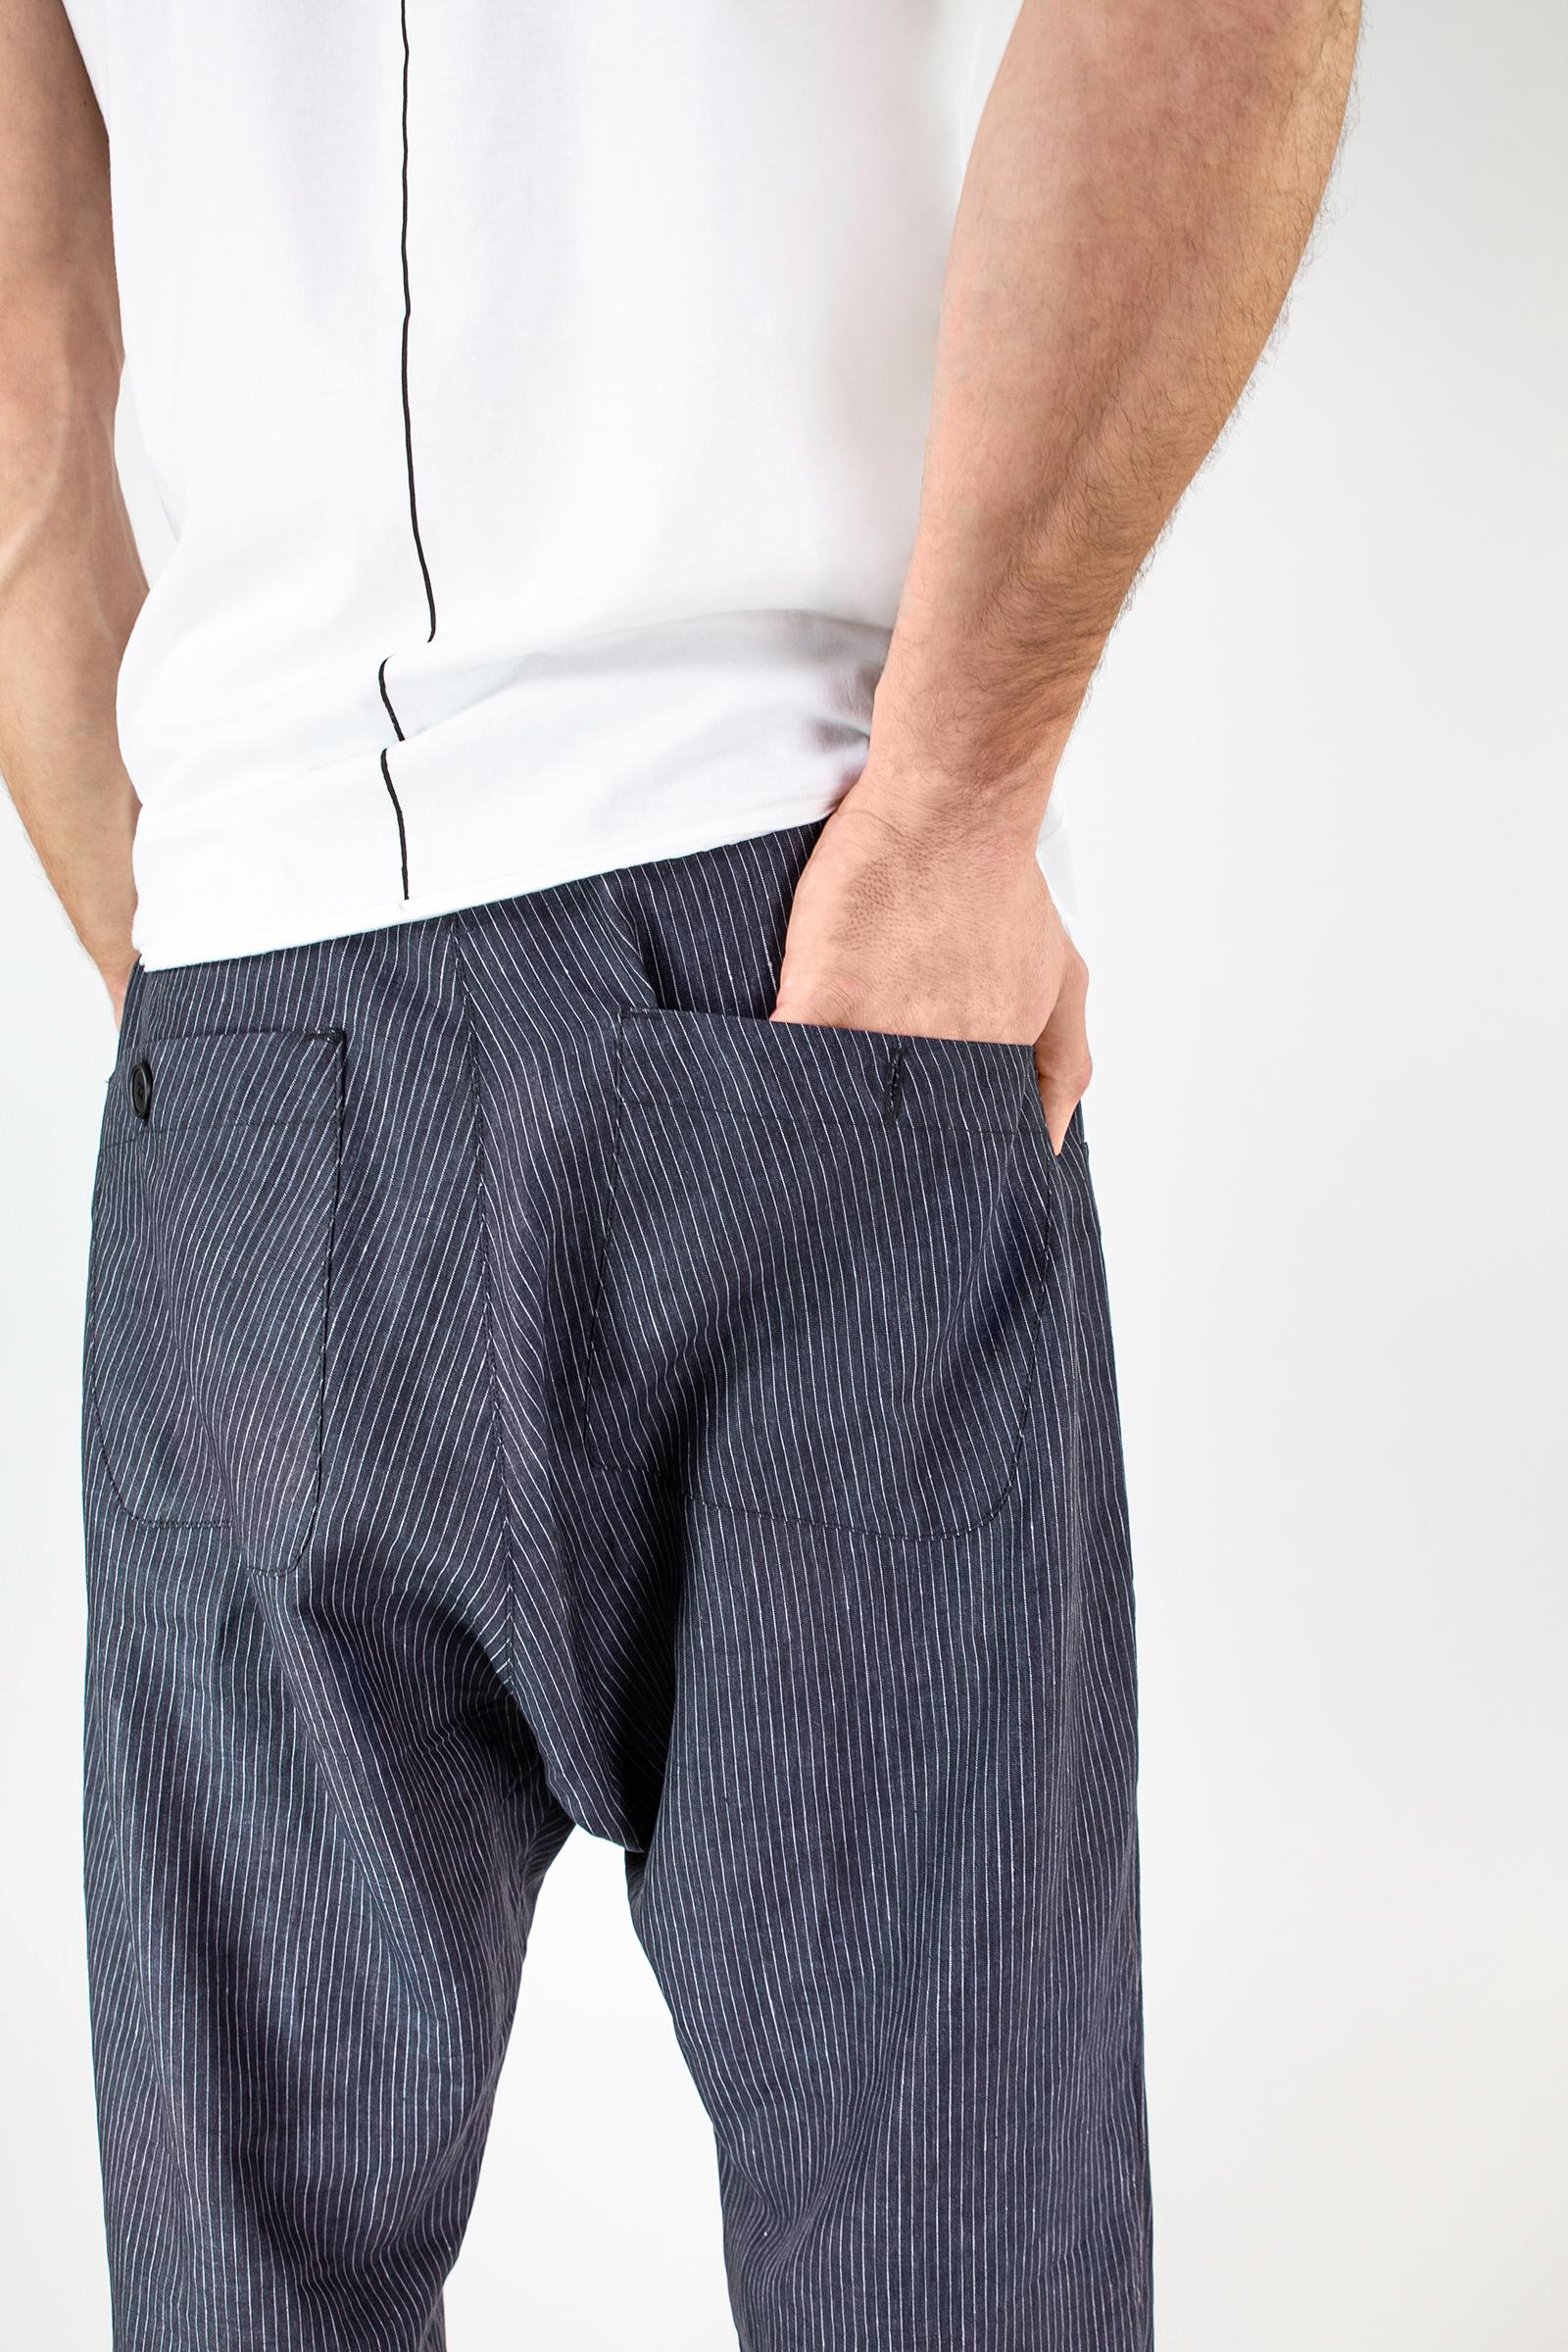 Img 6935 Ellisse Trousers